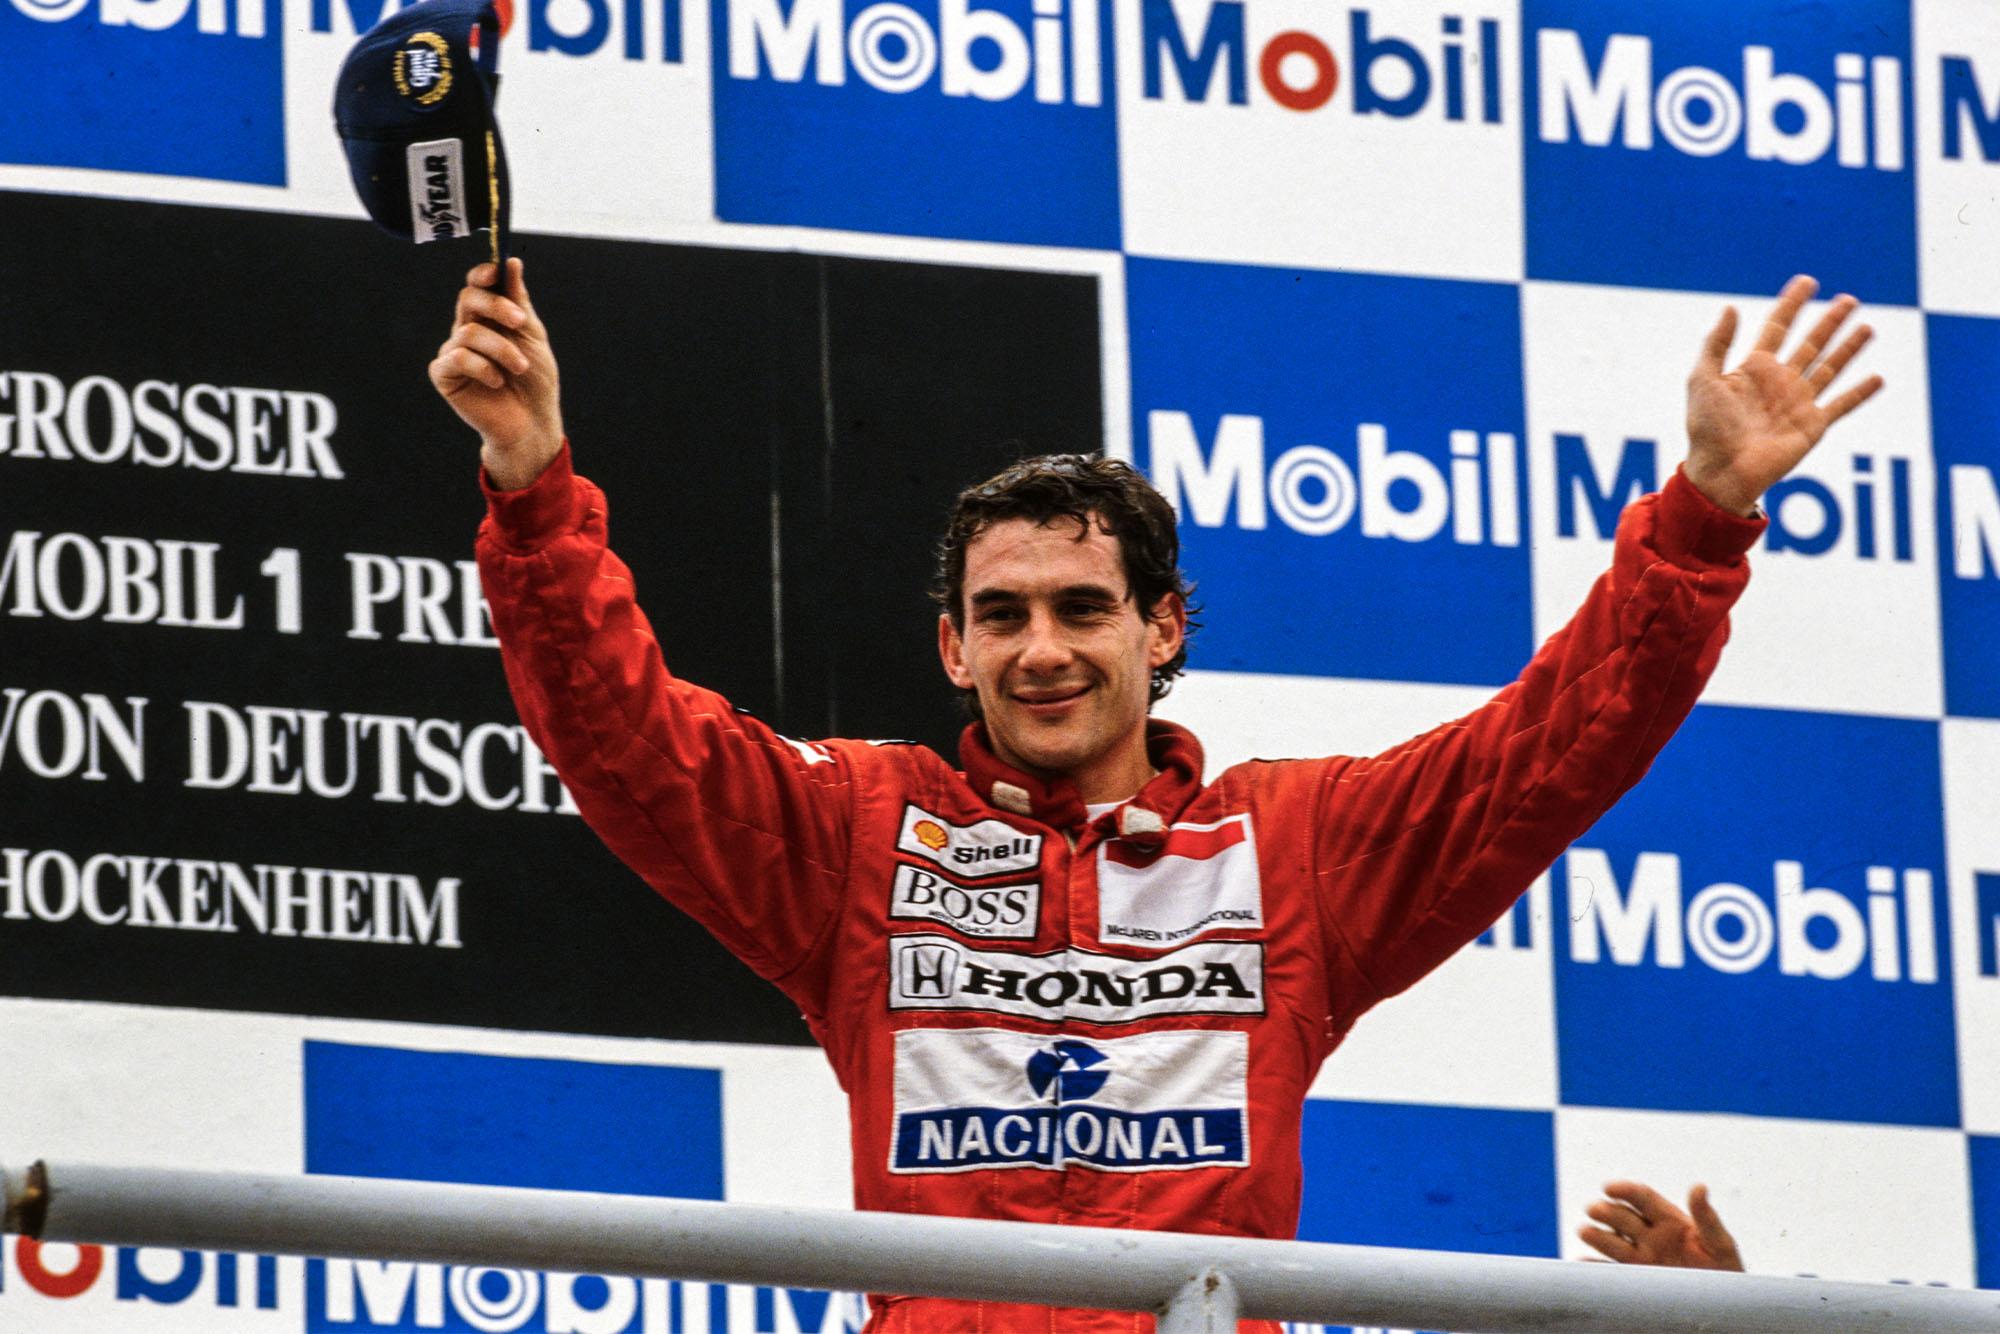 1989 GER GP podium